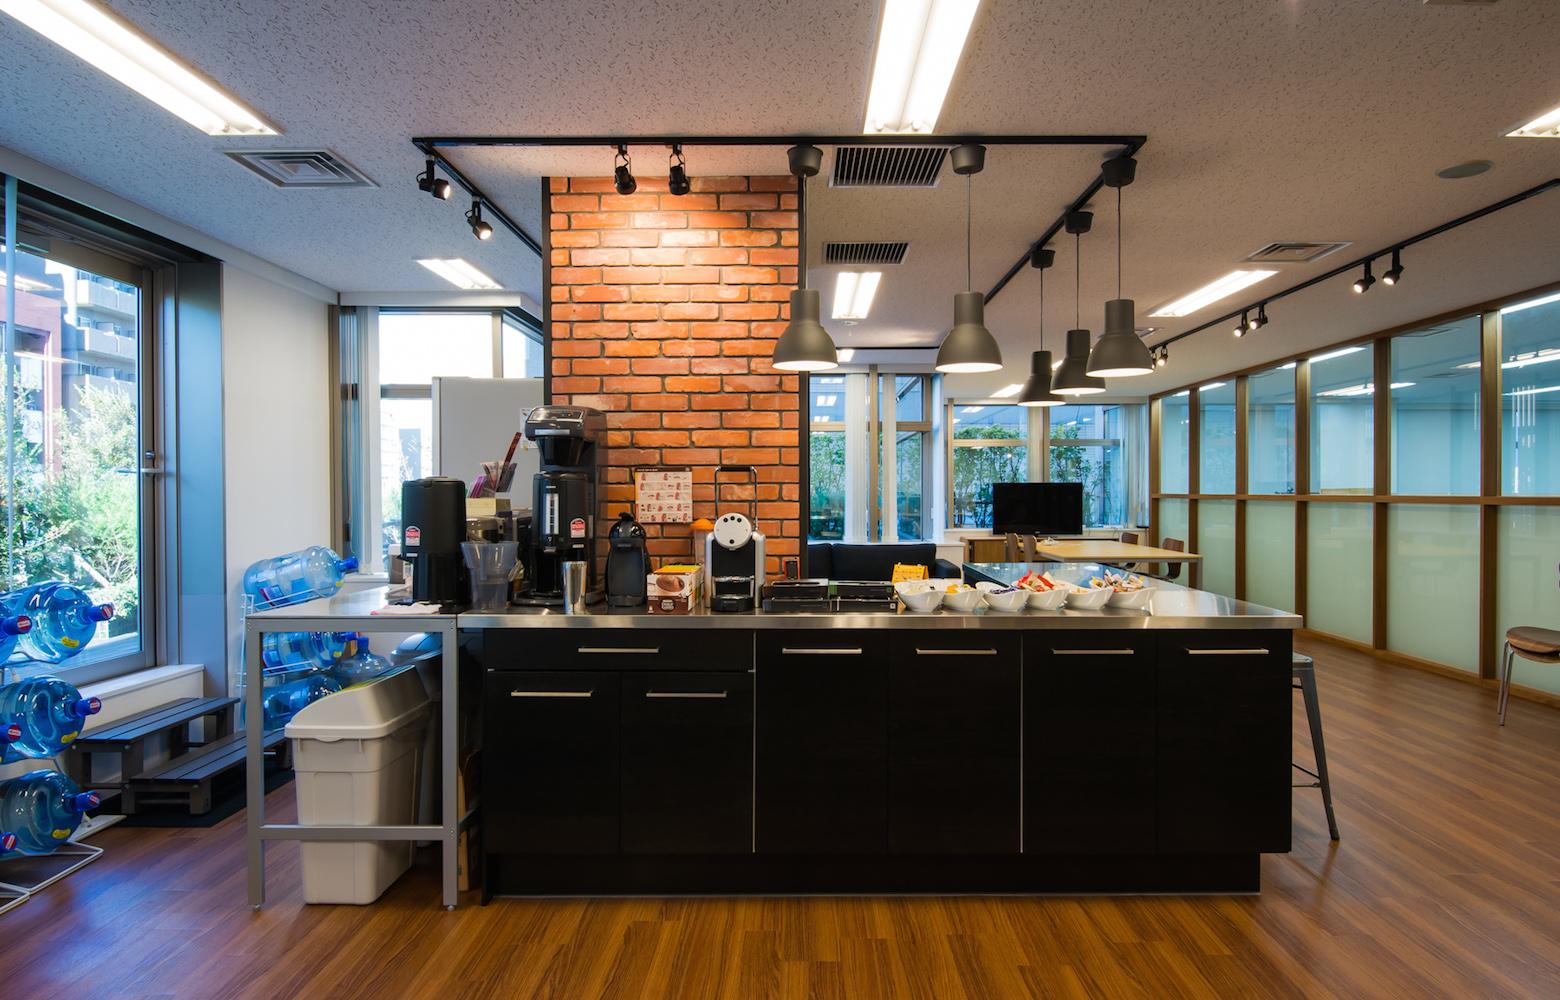 UIEvolution株式会社 vol.1 Cafe Counter デザイン・レイアウト事例